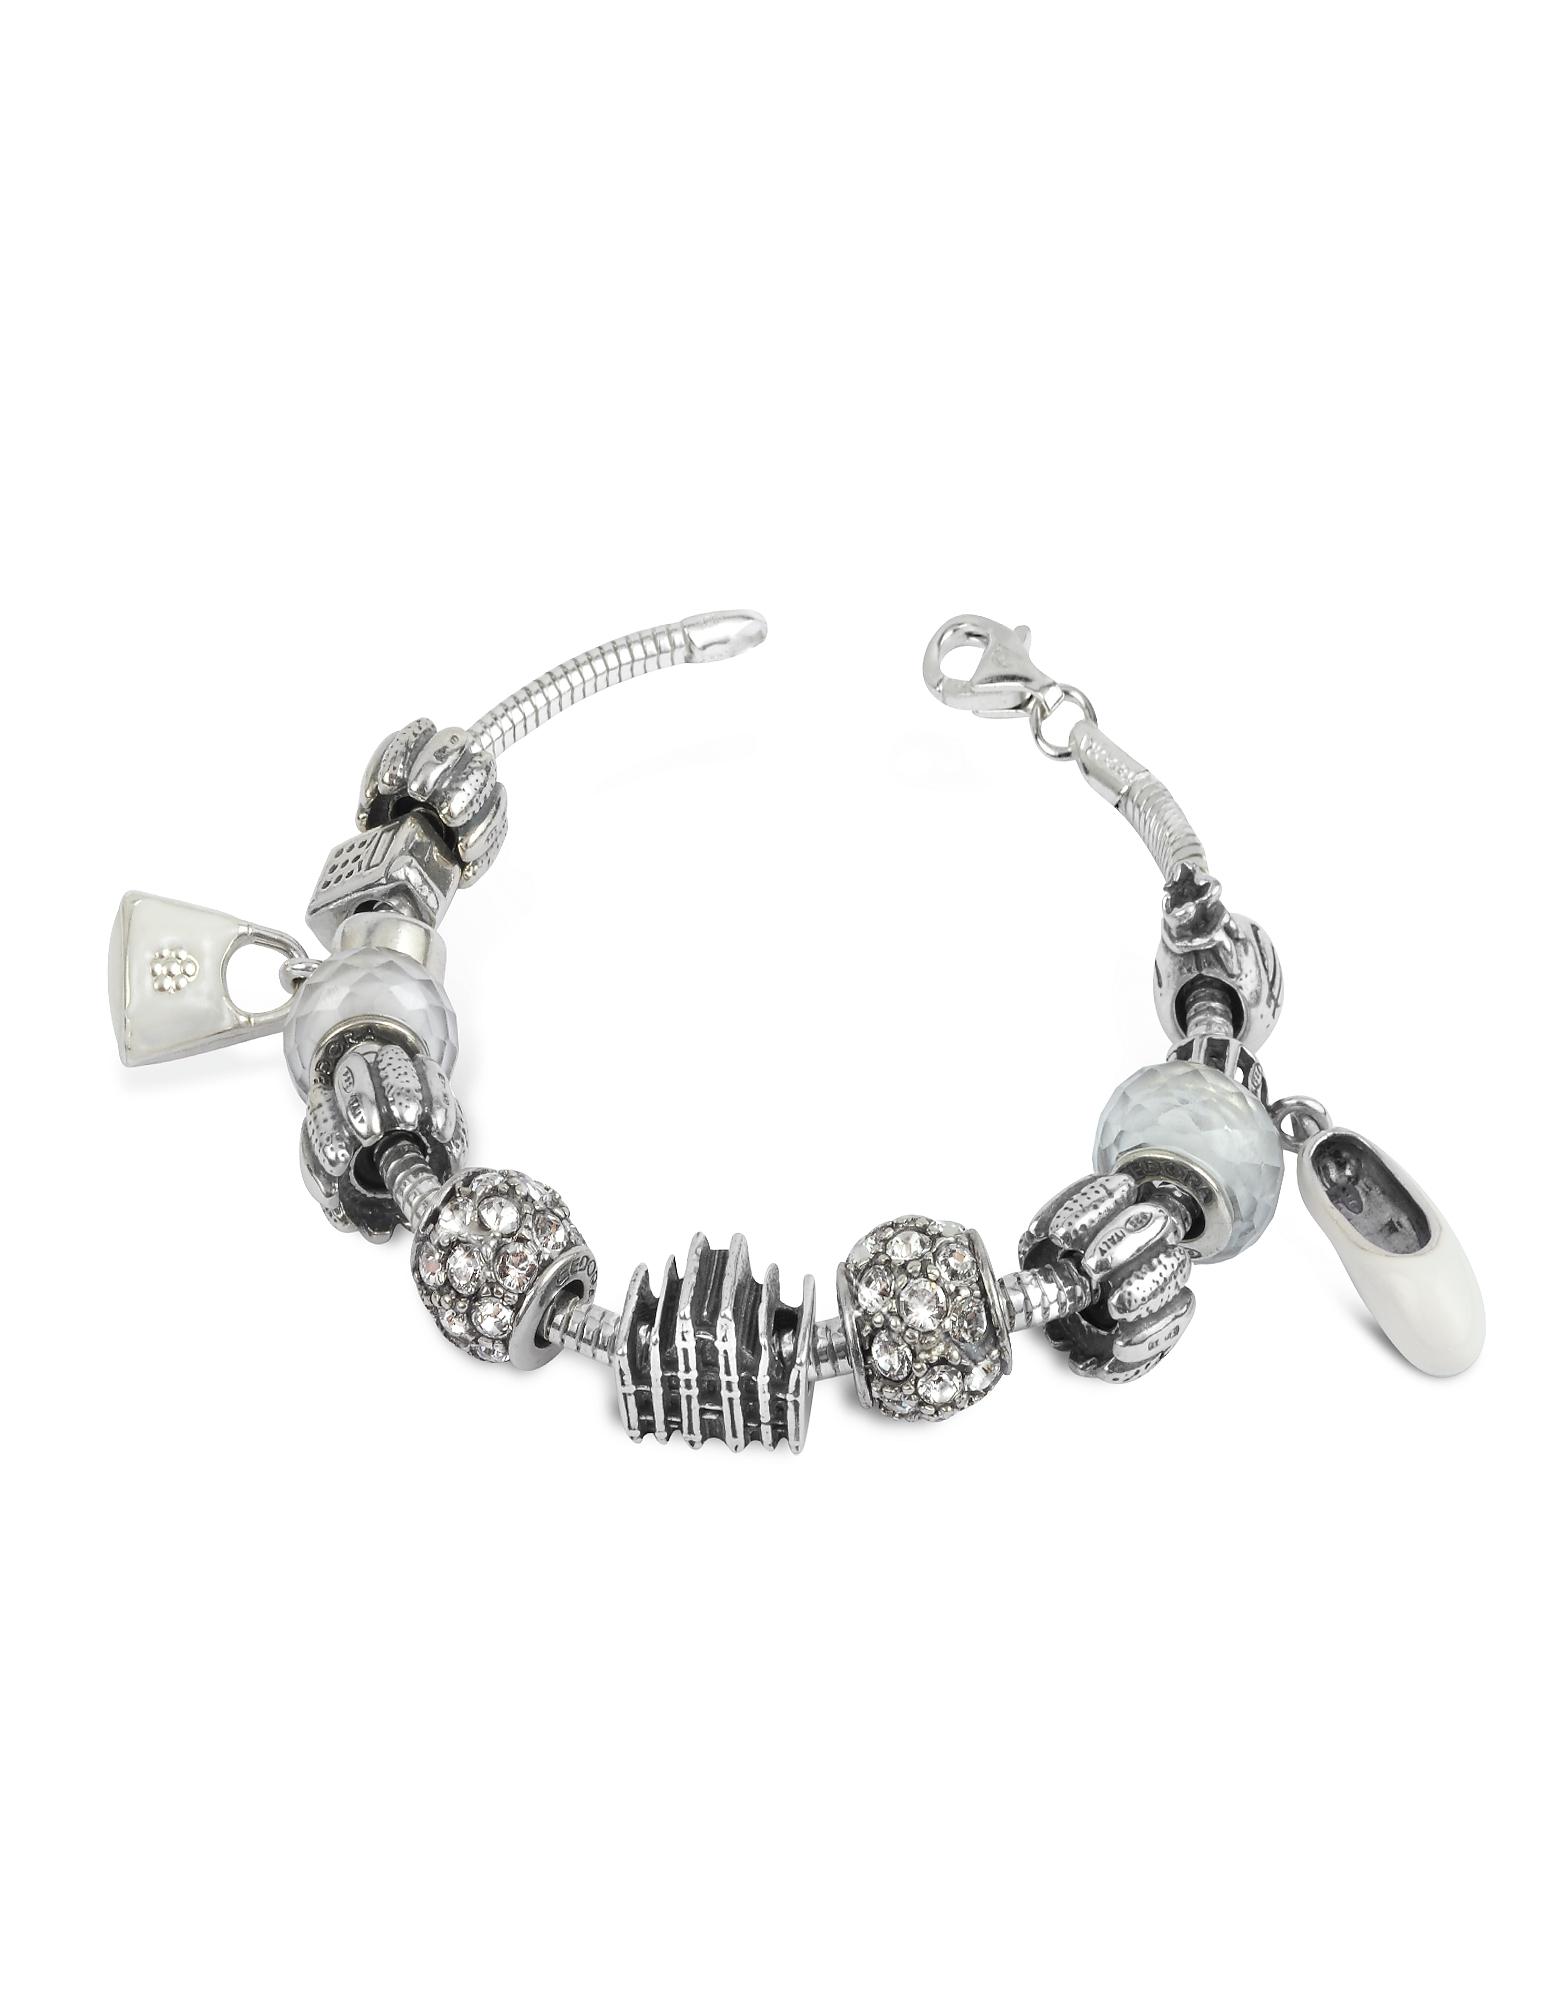 Tedora Bracelets, Sterling Silver Milan Charm Bracelet